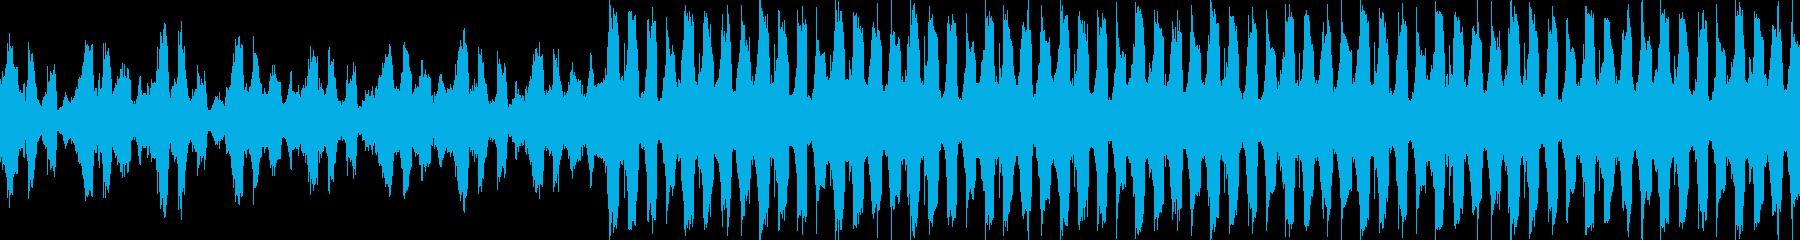 VP、CM、クールで穏やか透明感ループcの再生済みの波形